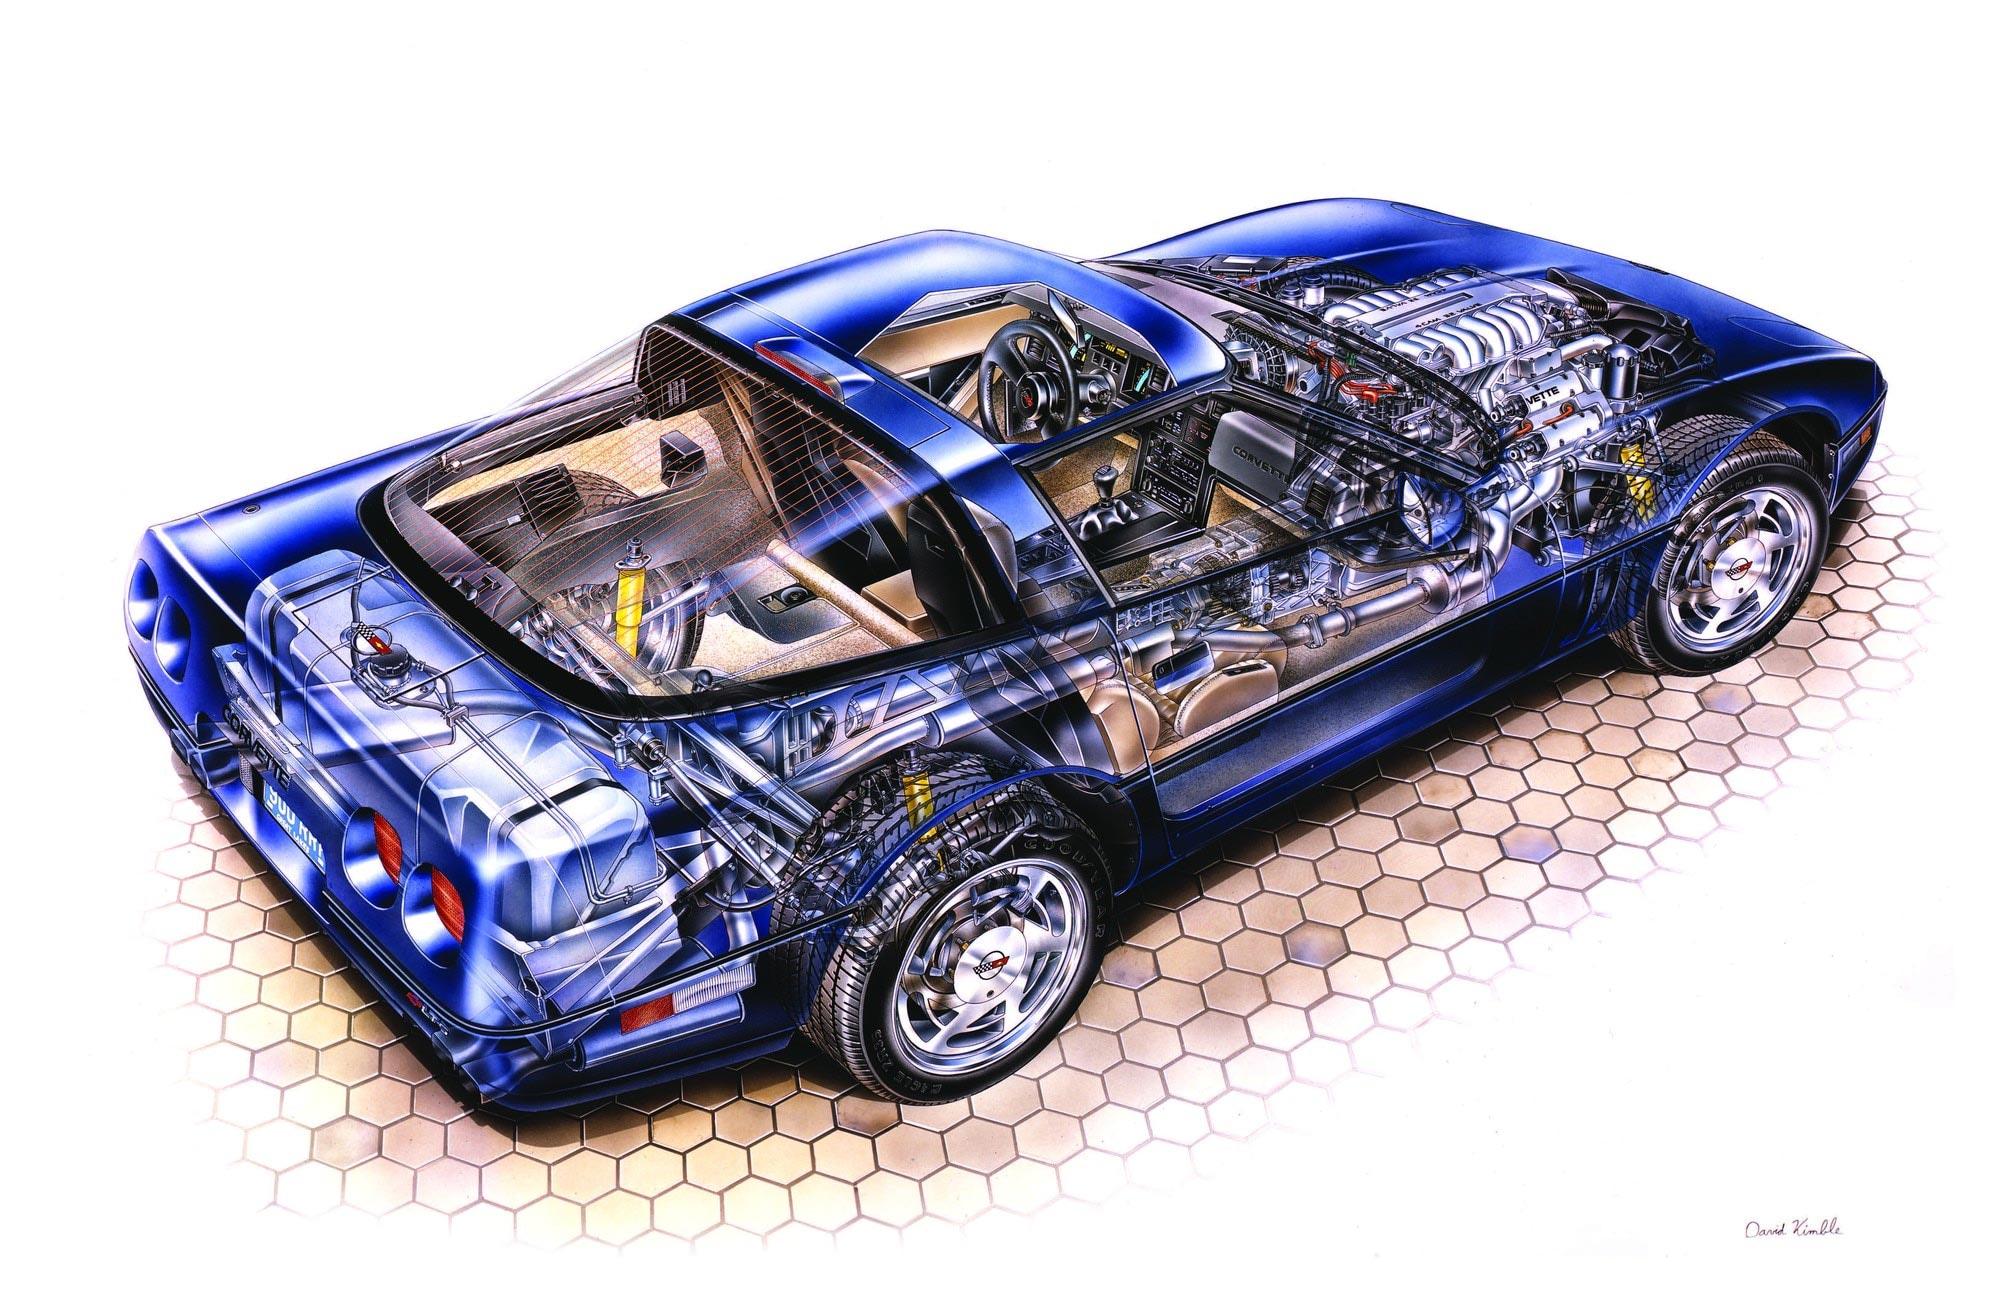 Chevrolet Corvette ZR1 cutaway